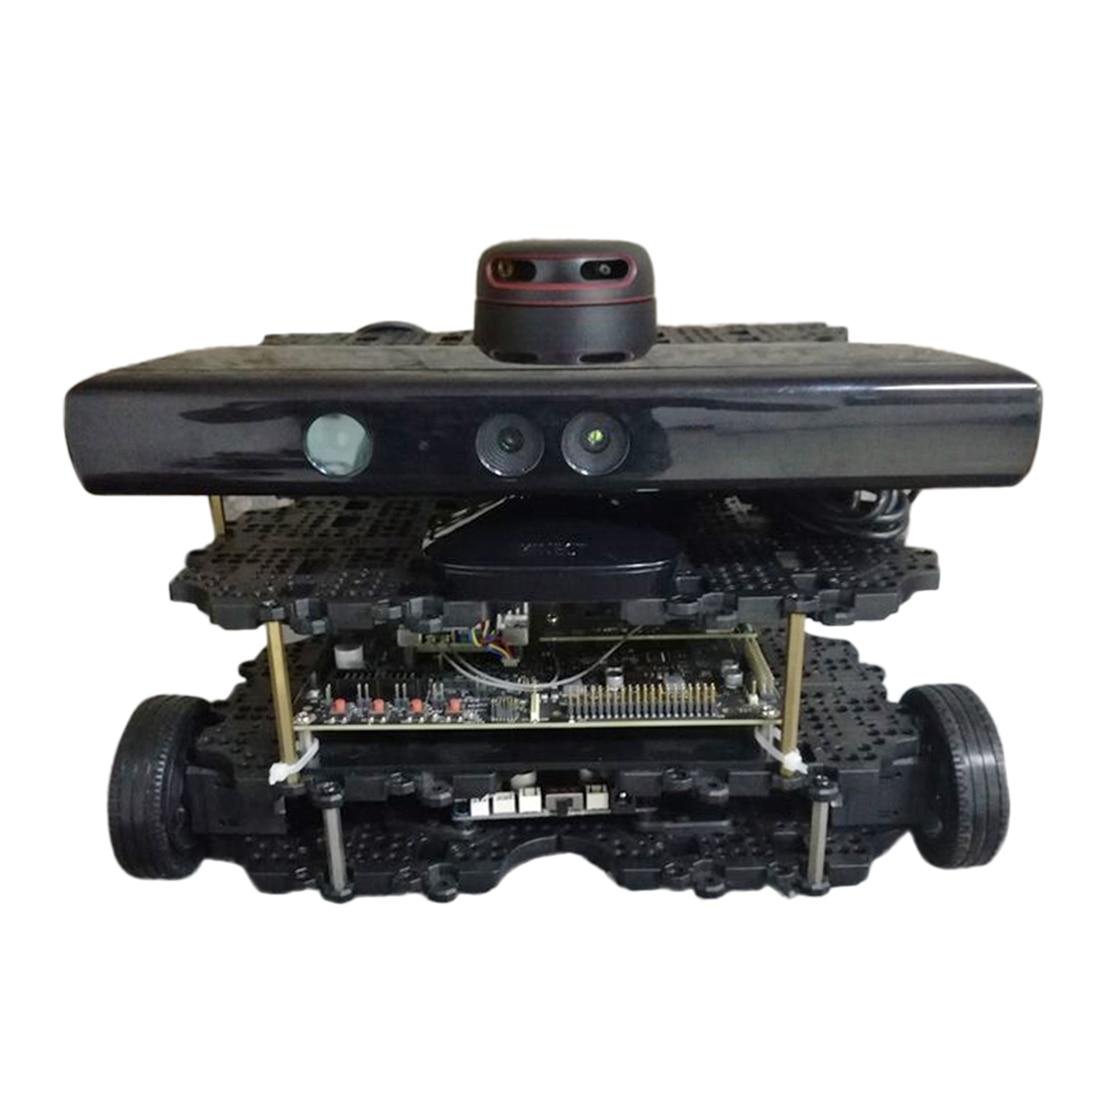 Burger Version Robot Operating System Autopilot Robot Car Open Source Kit For Children Kids Developmental Early Educational Toys